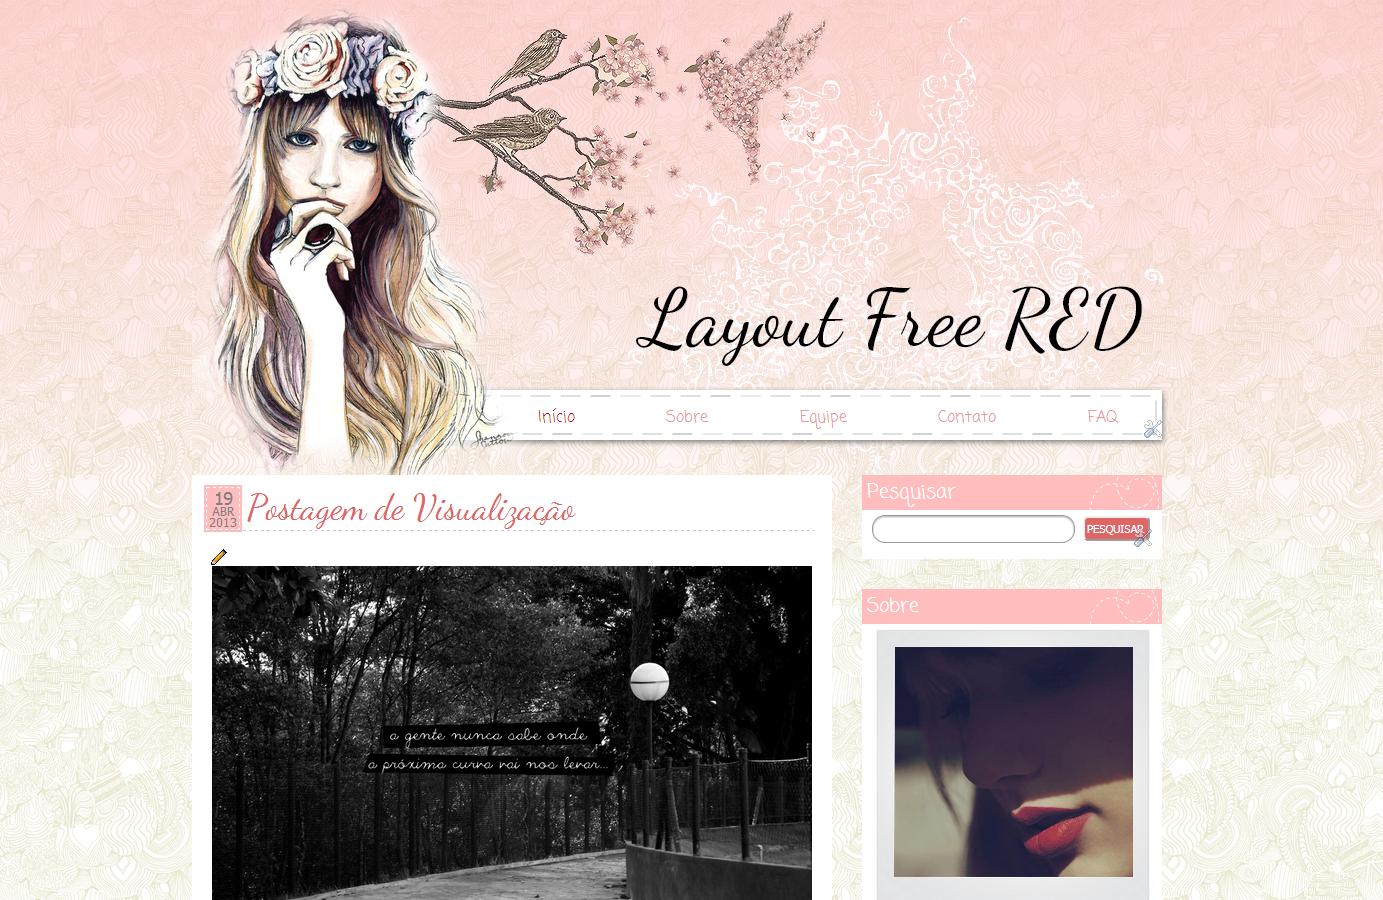 Super Pro seu blog: Top 10 templates free (lindos!) | Bendita Moça NW61